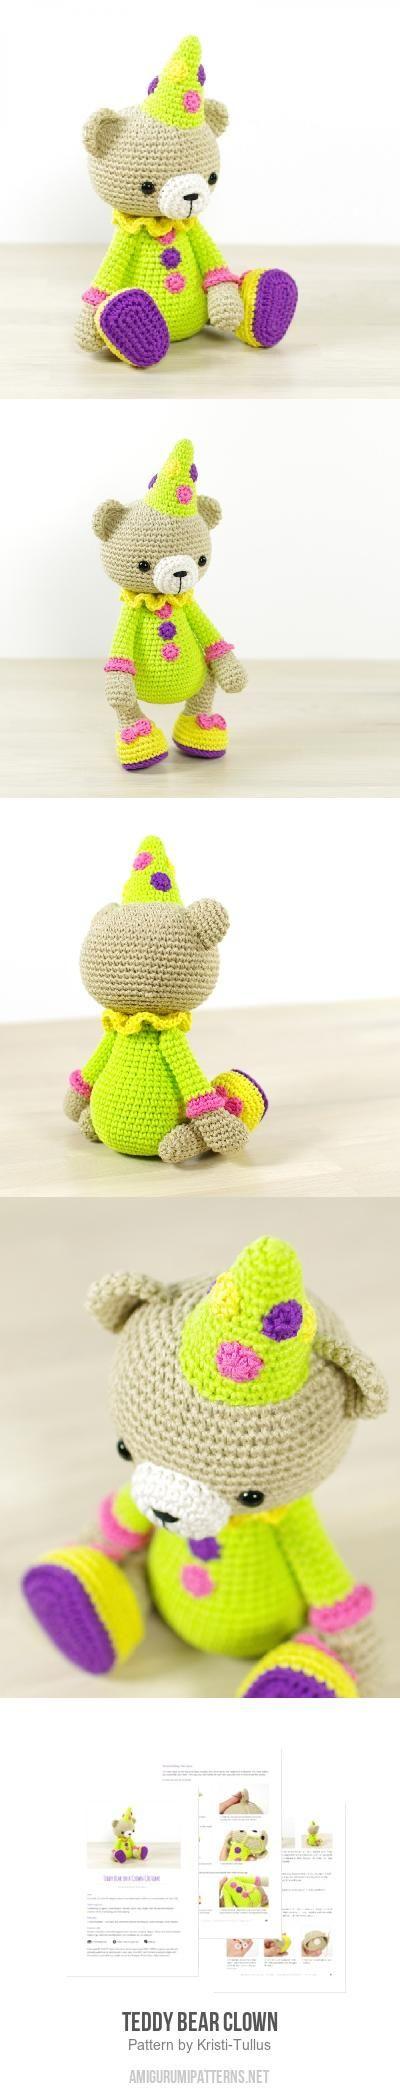 Teddy Bear Clown amigurumi pattern by Kristi Tullus | Osos, Patrones ...